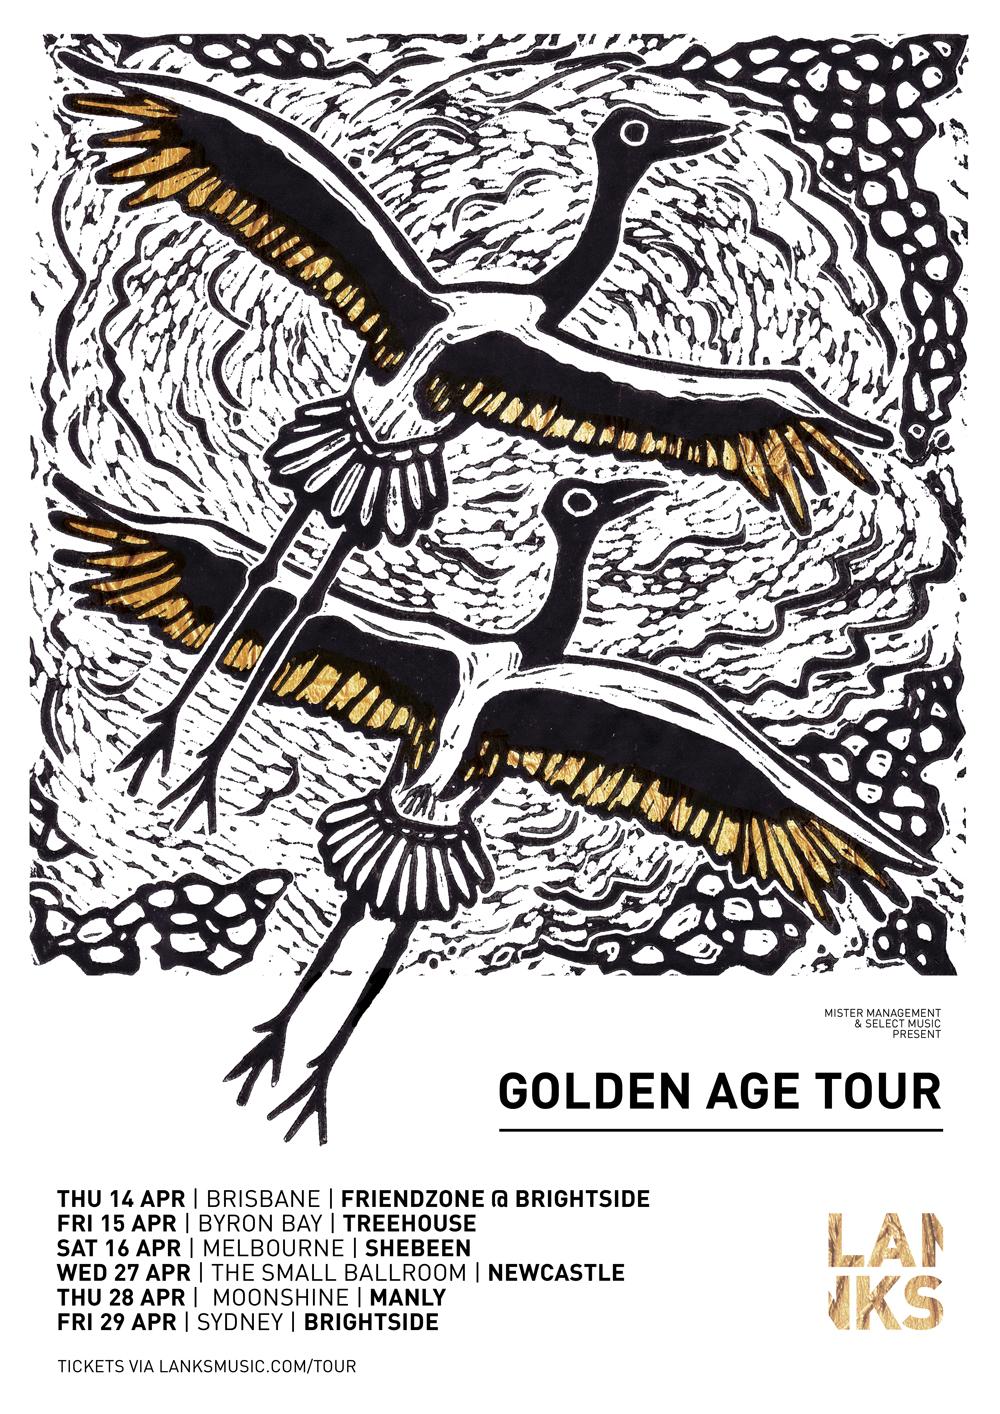 GoldenAgeTour_A3-Poster_01.jpg